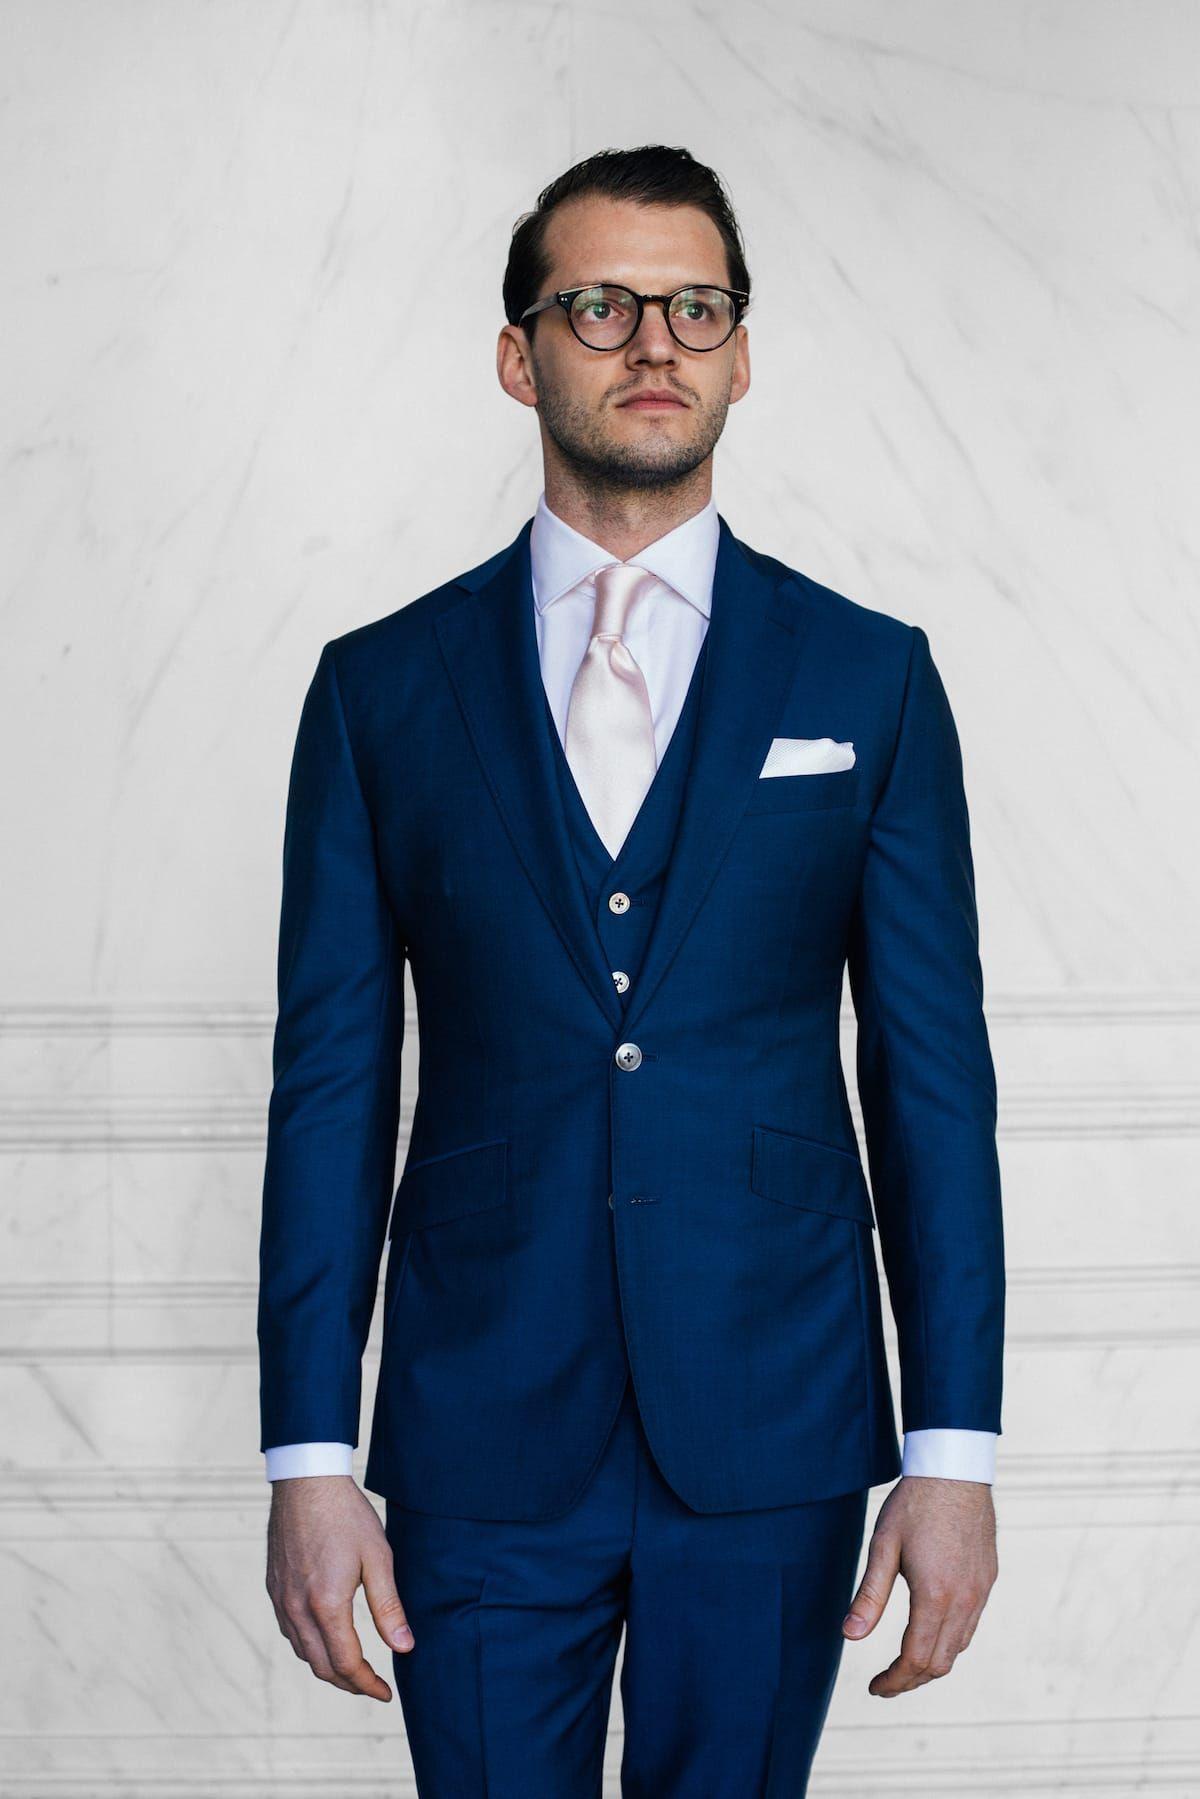 Mens En Three TrouwpakFashion Blauw SuitSuits Piece wOPX8n0k